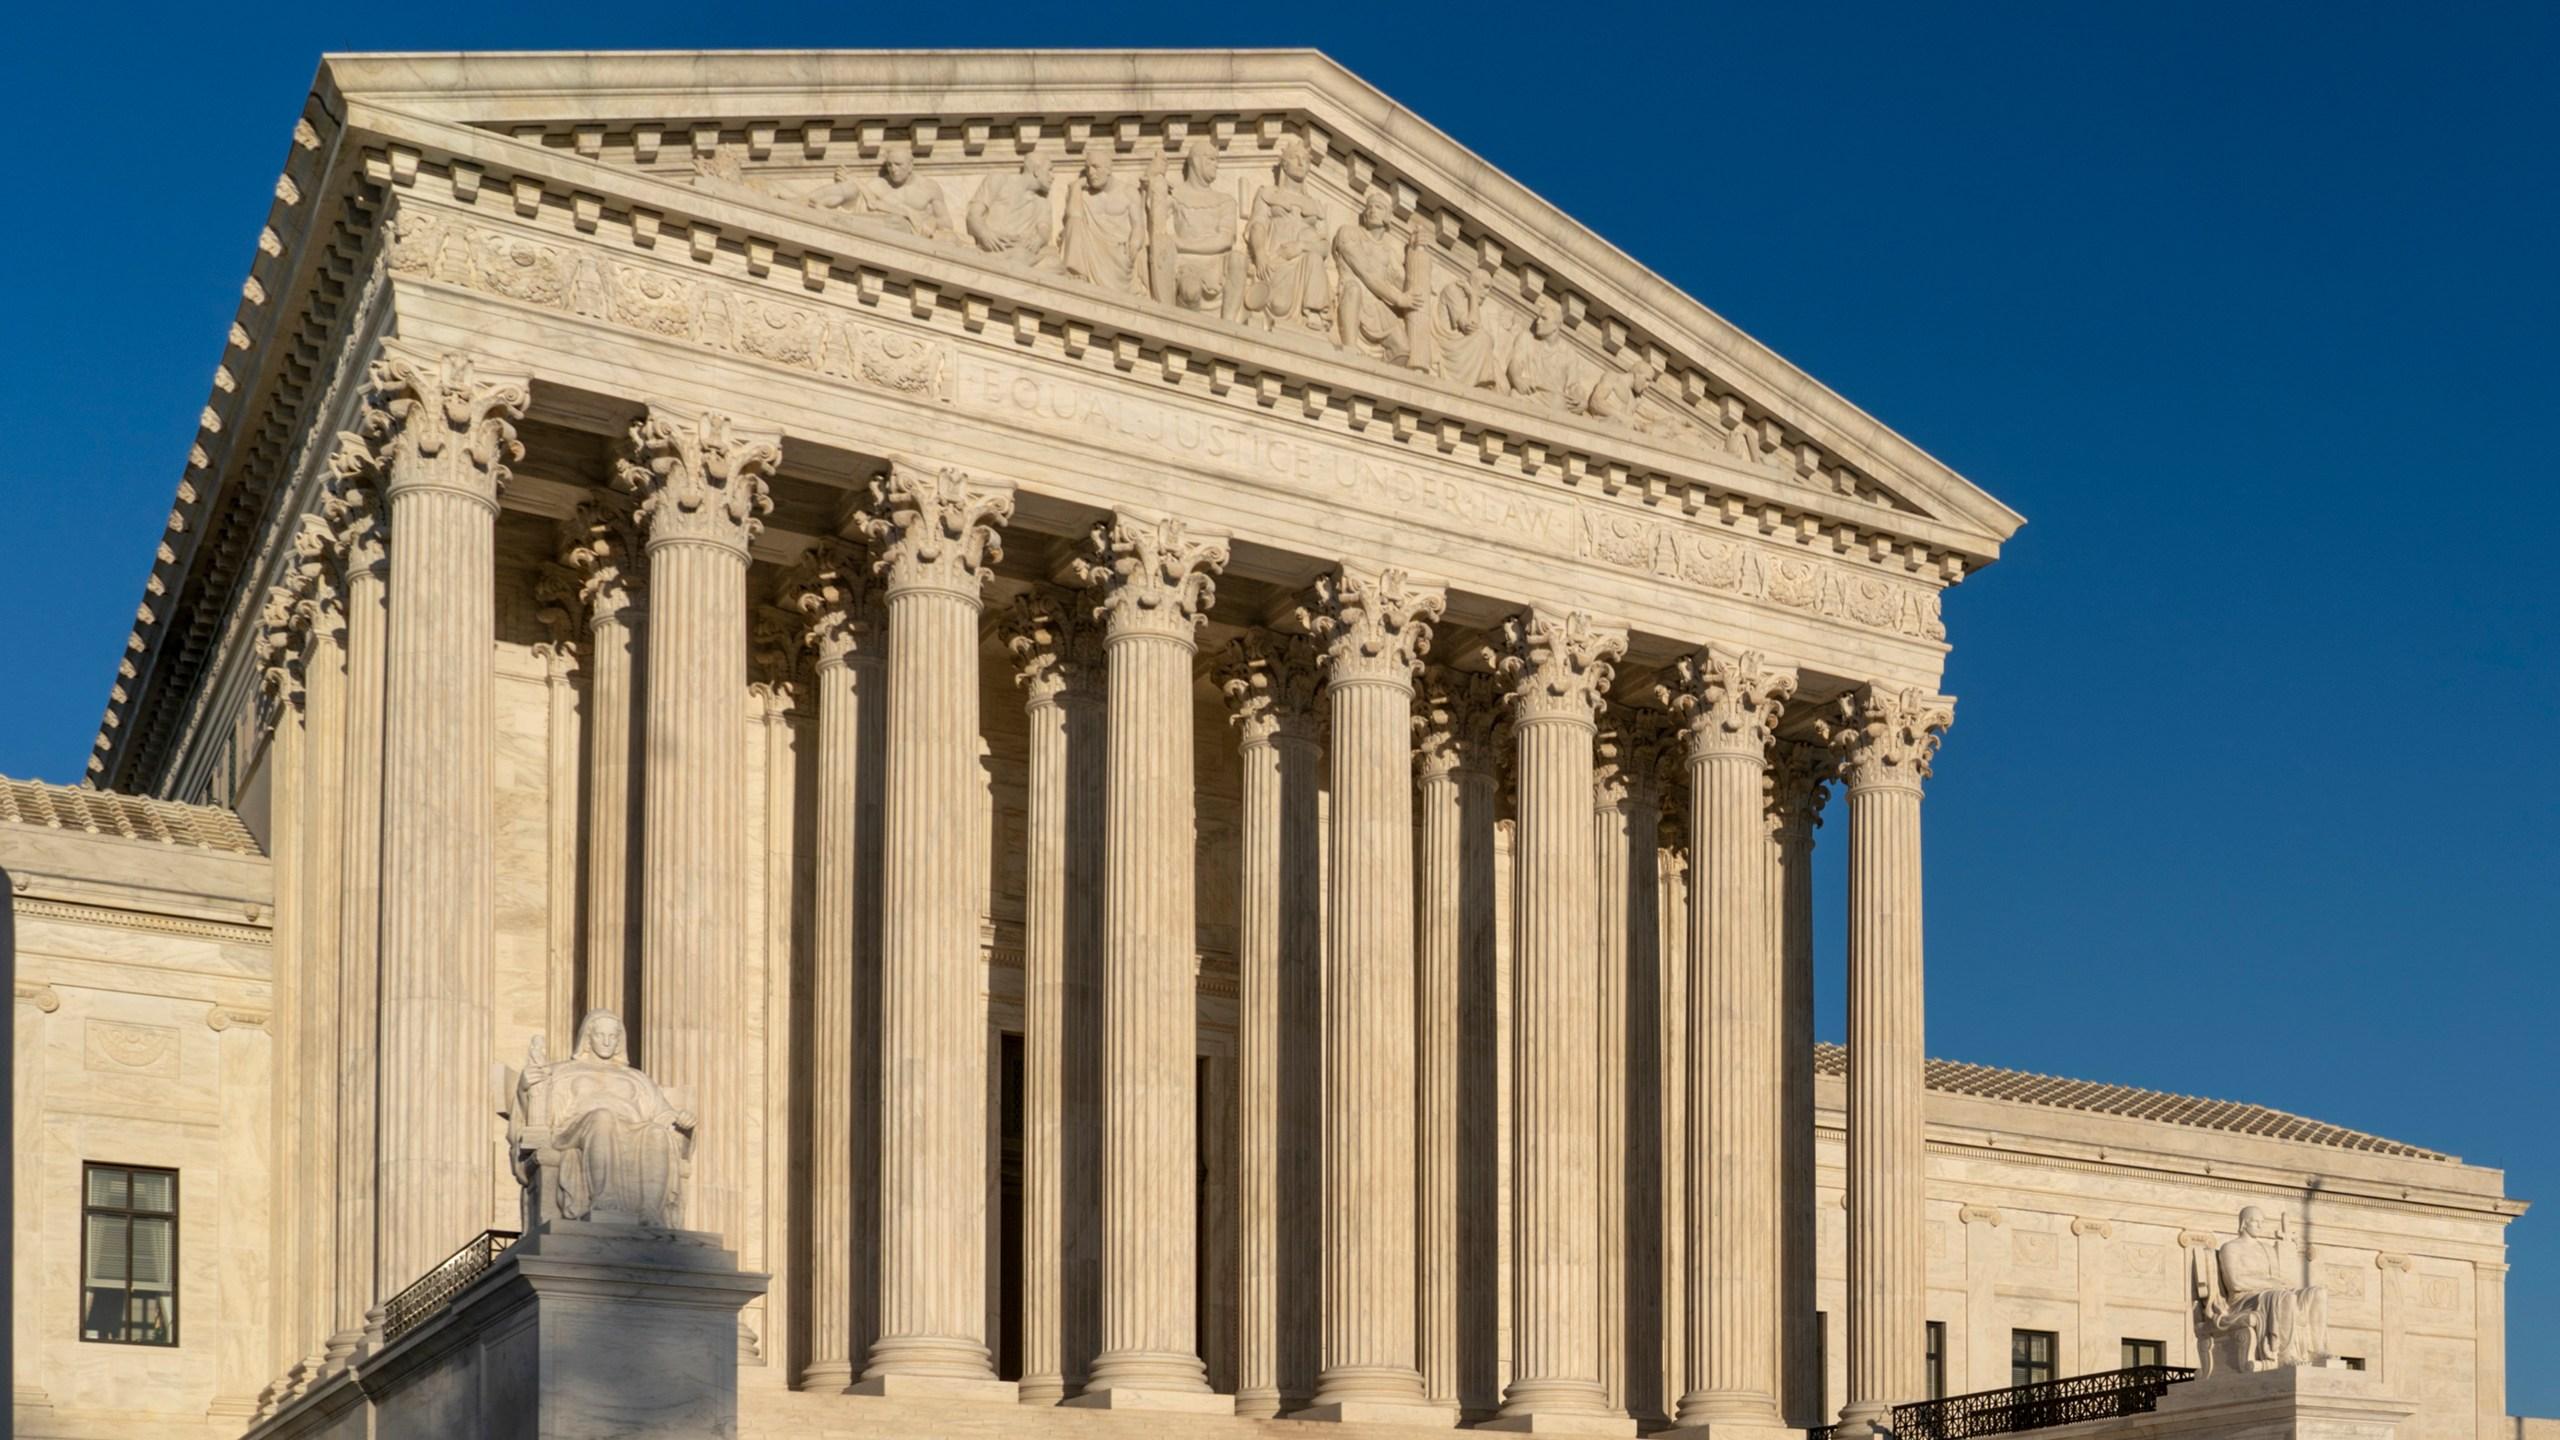 Supreme_Court_Travel_Ban_40039-159532.jpg76519734